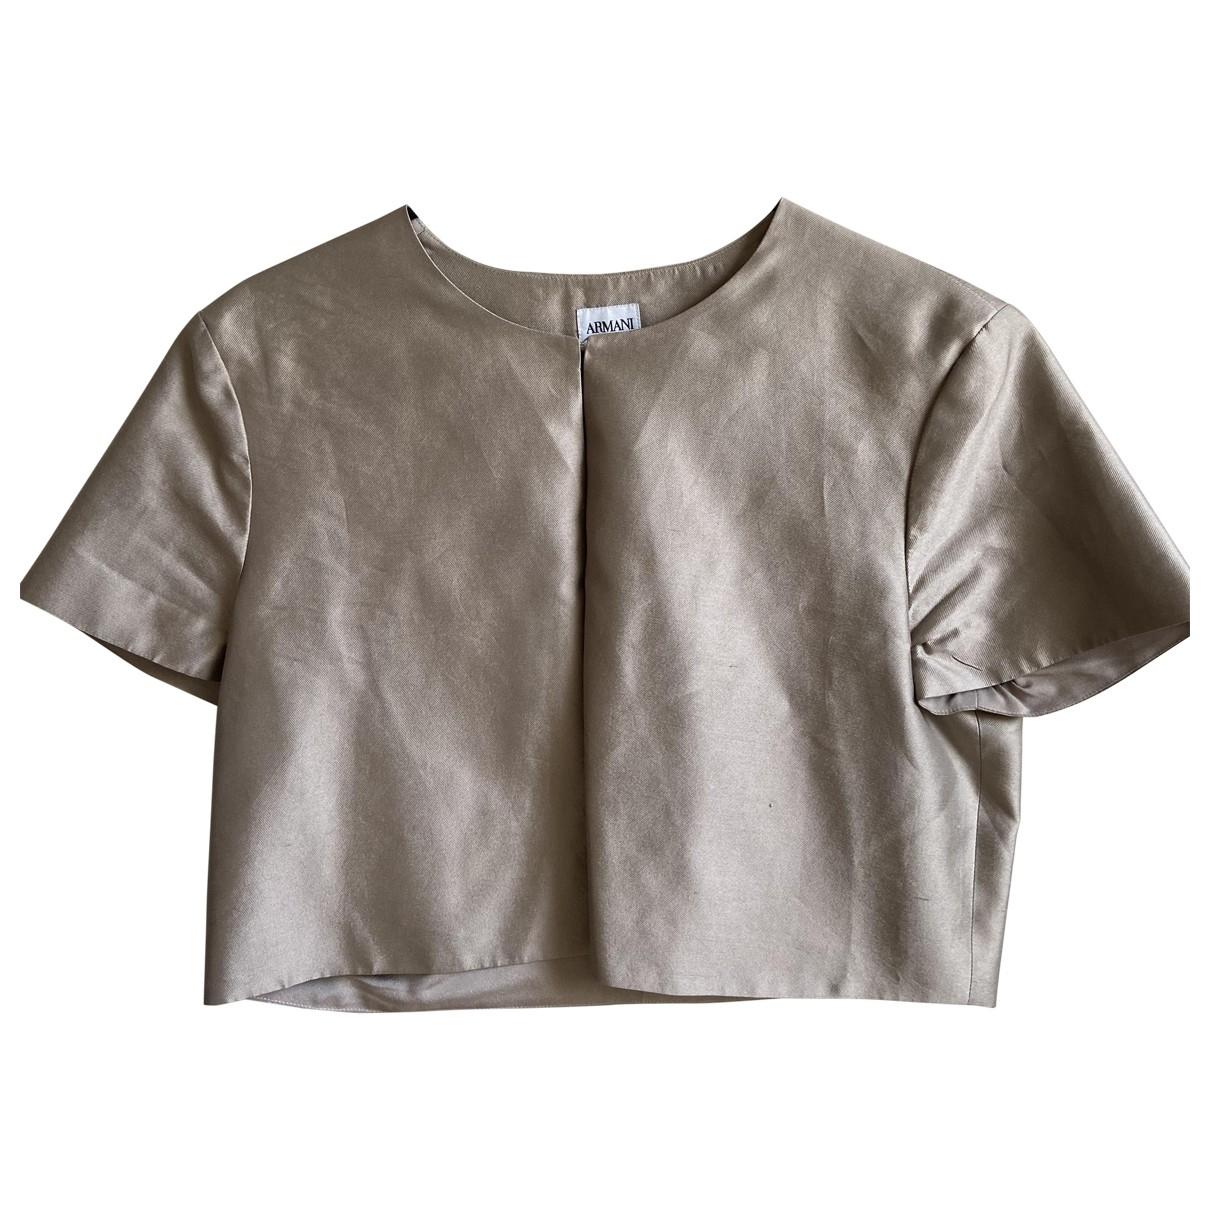 Armani Collezioni \N Camel jacket for Women 44 IT